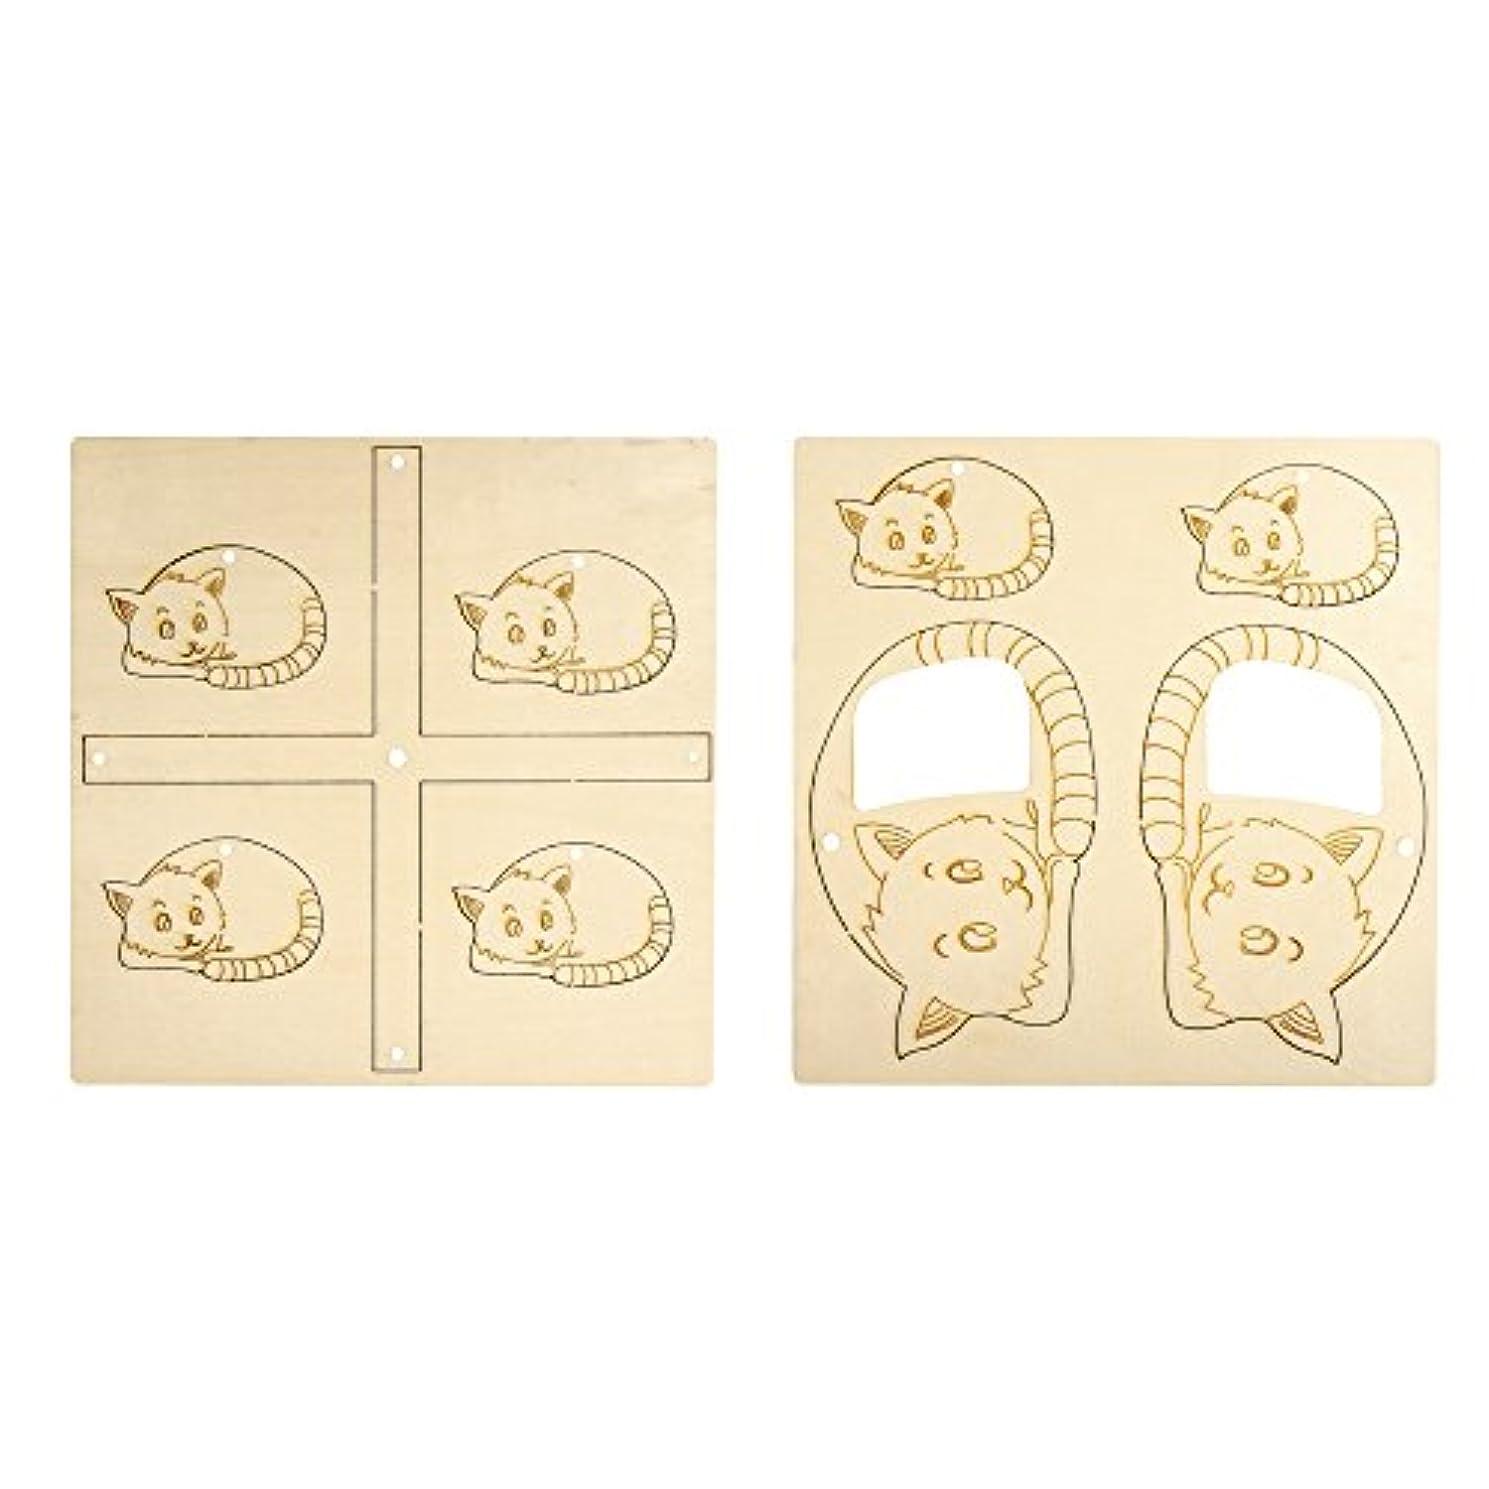 Rayher Wooden Hobby 62605000–Mobile Set-Fsc 100%, 21 x 21 cm, 9–Piece 4 M Cord Tab Bag 1 Set